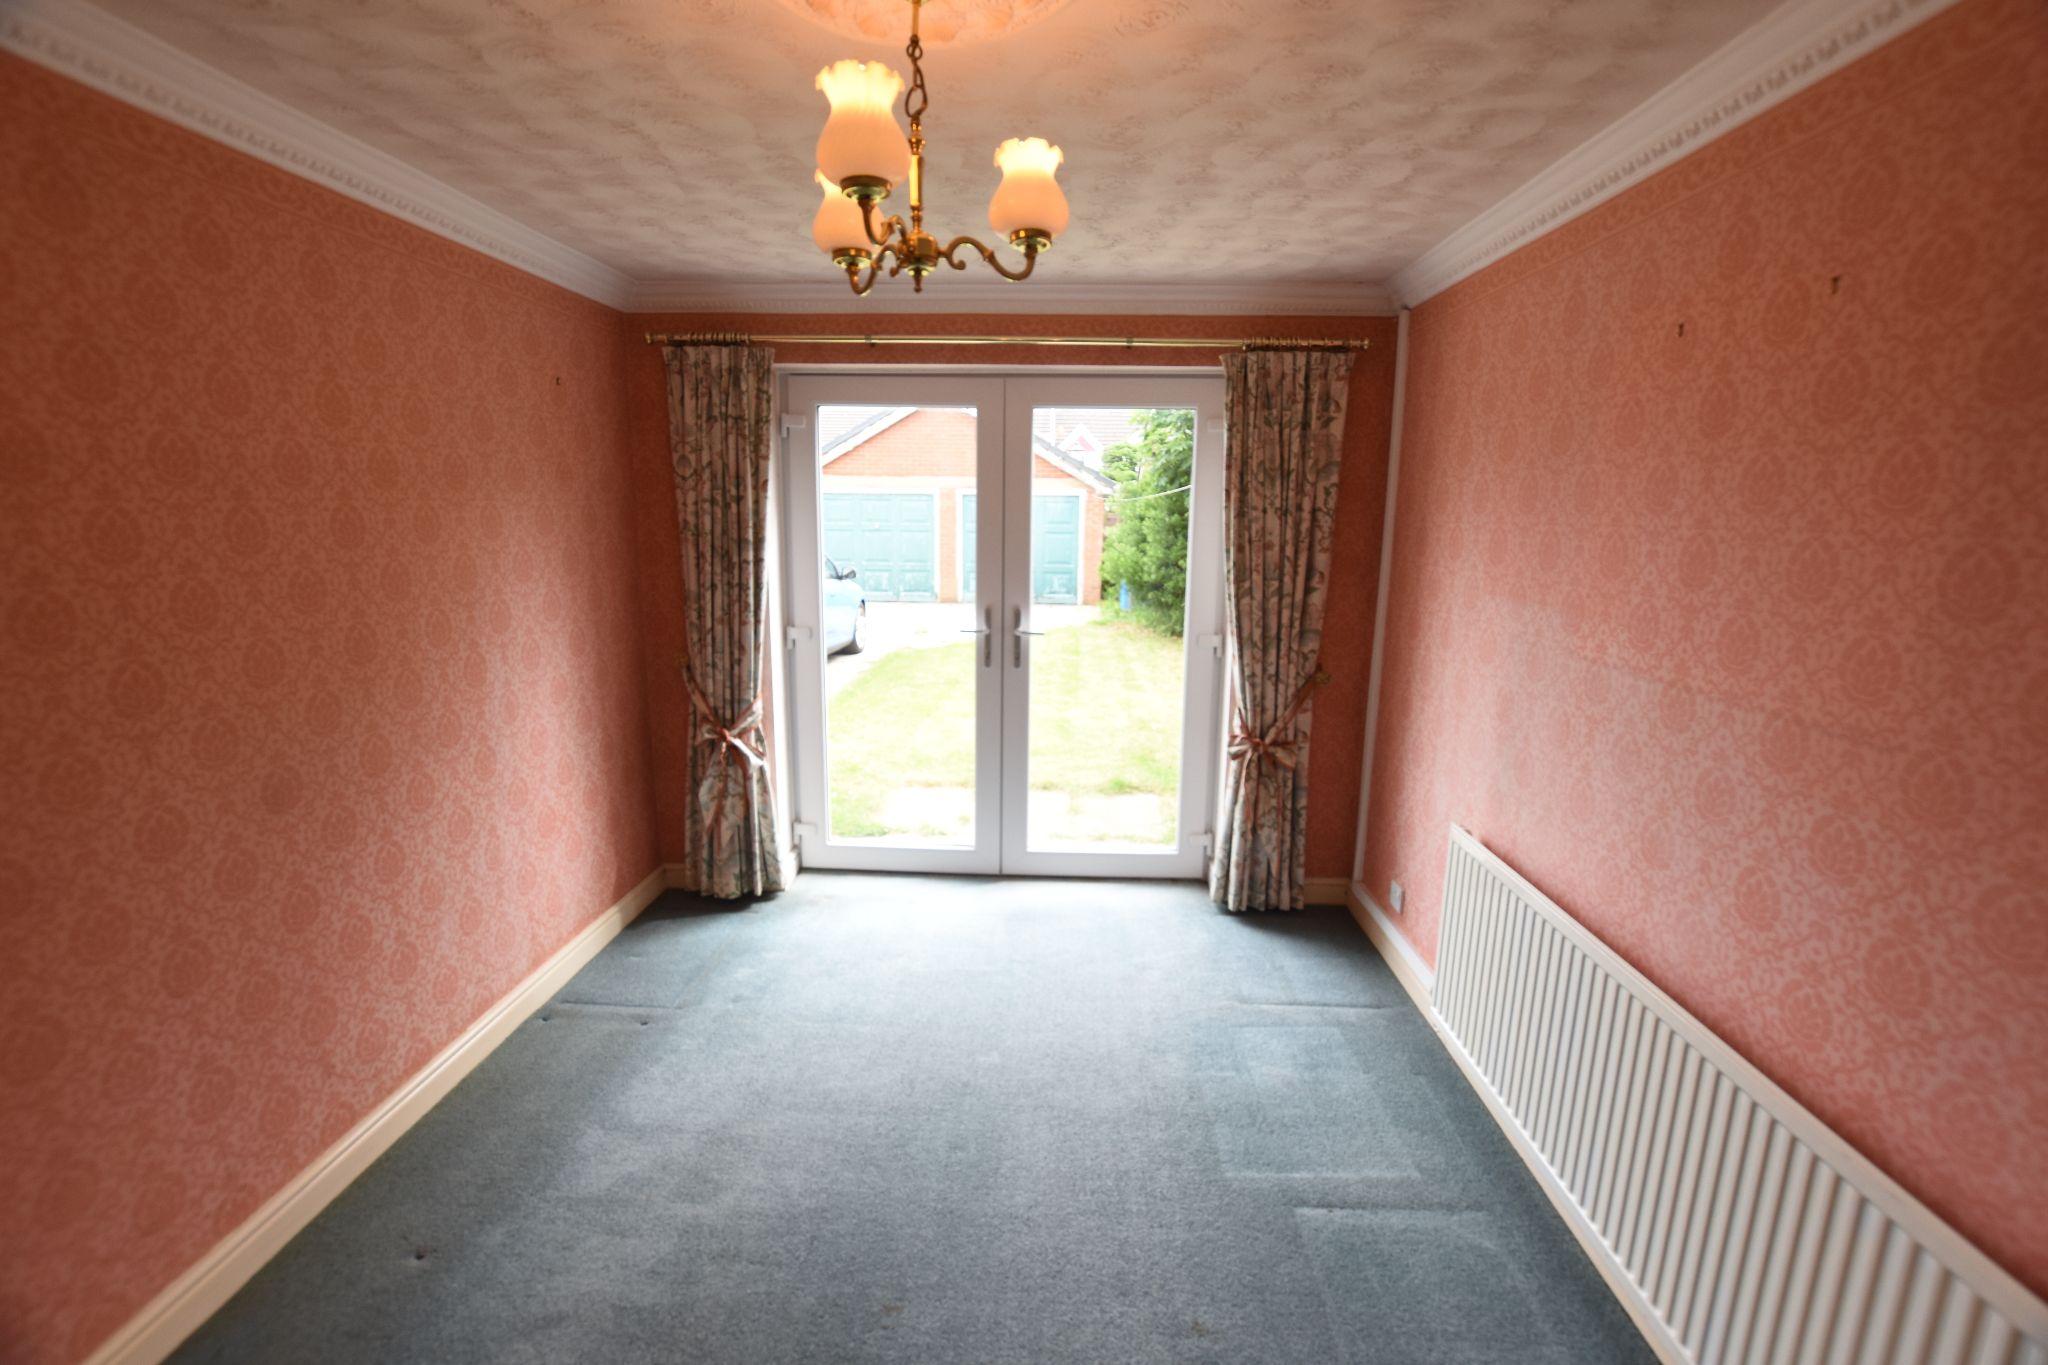 4 bedroom detached house Sold STC in Preston - Diner